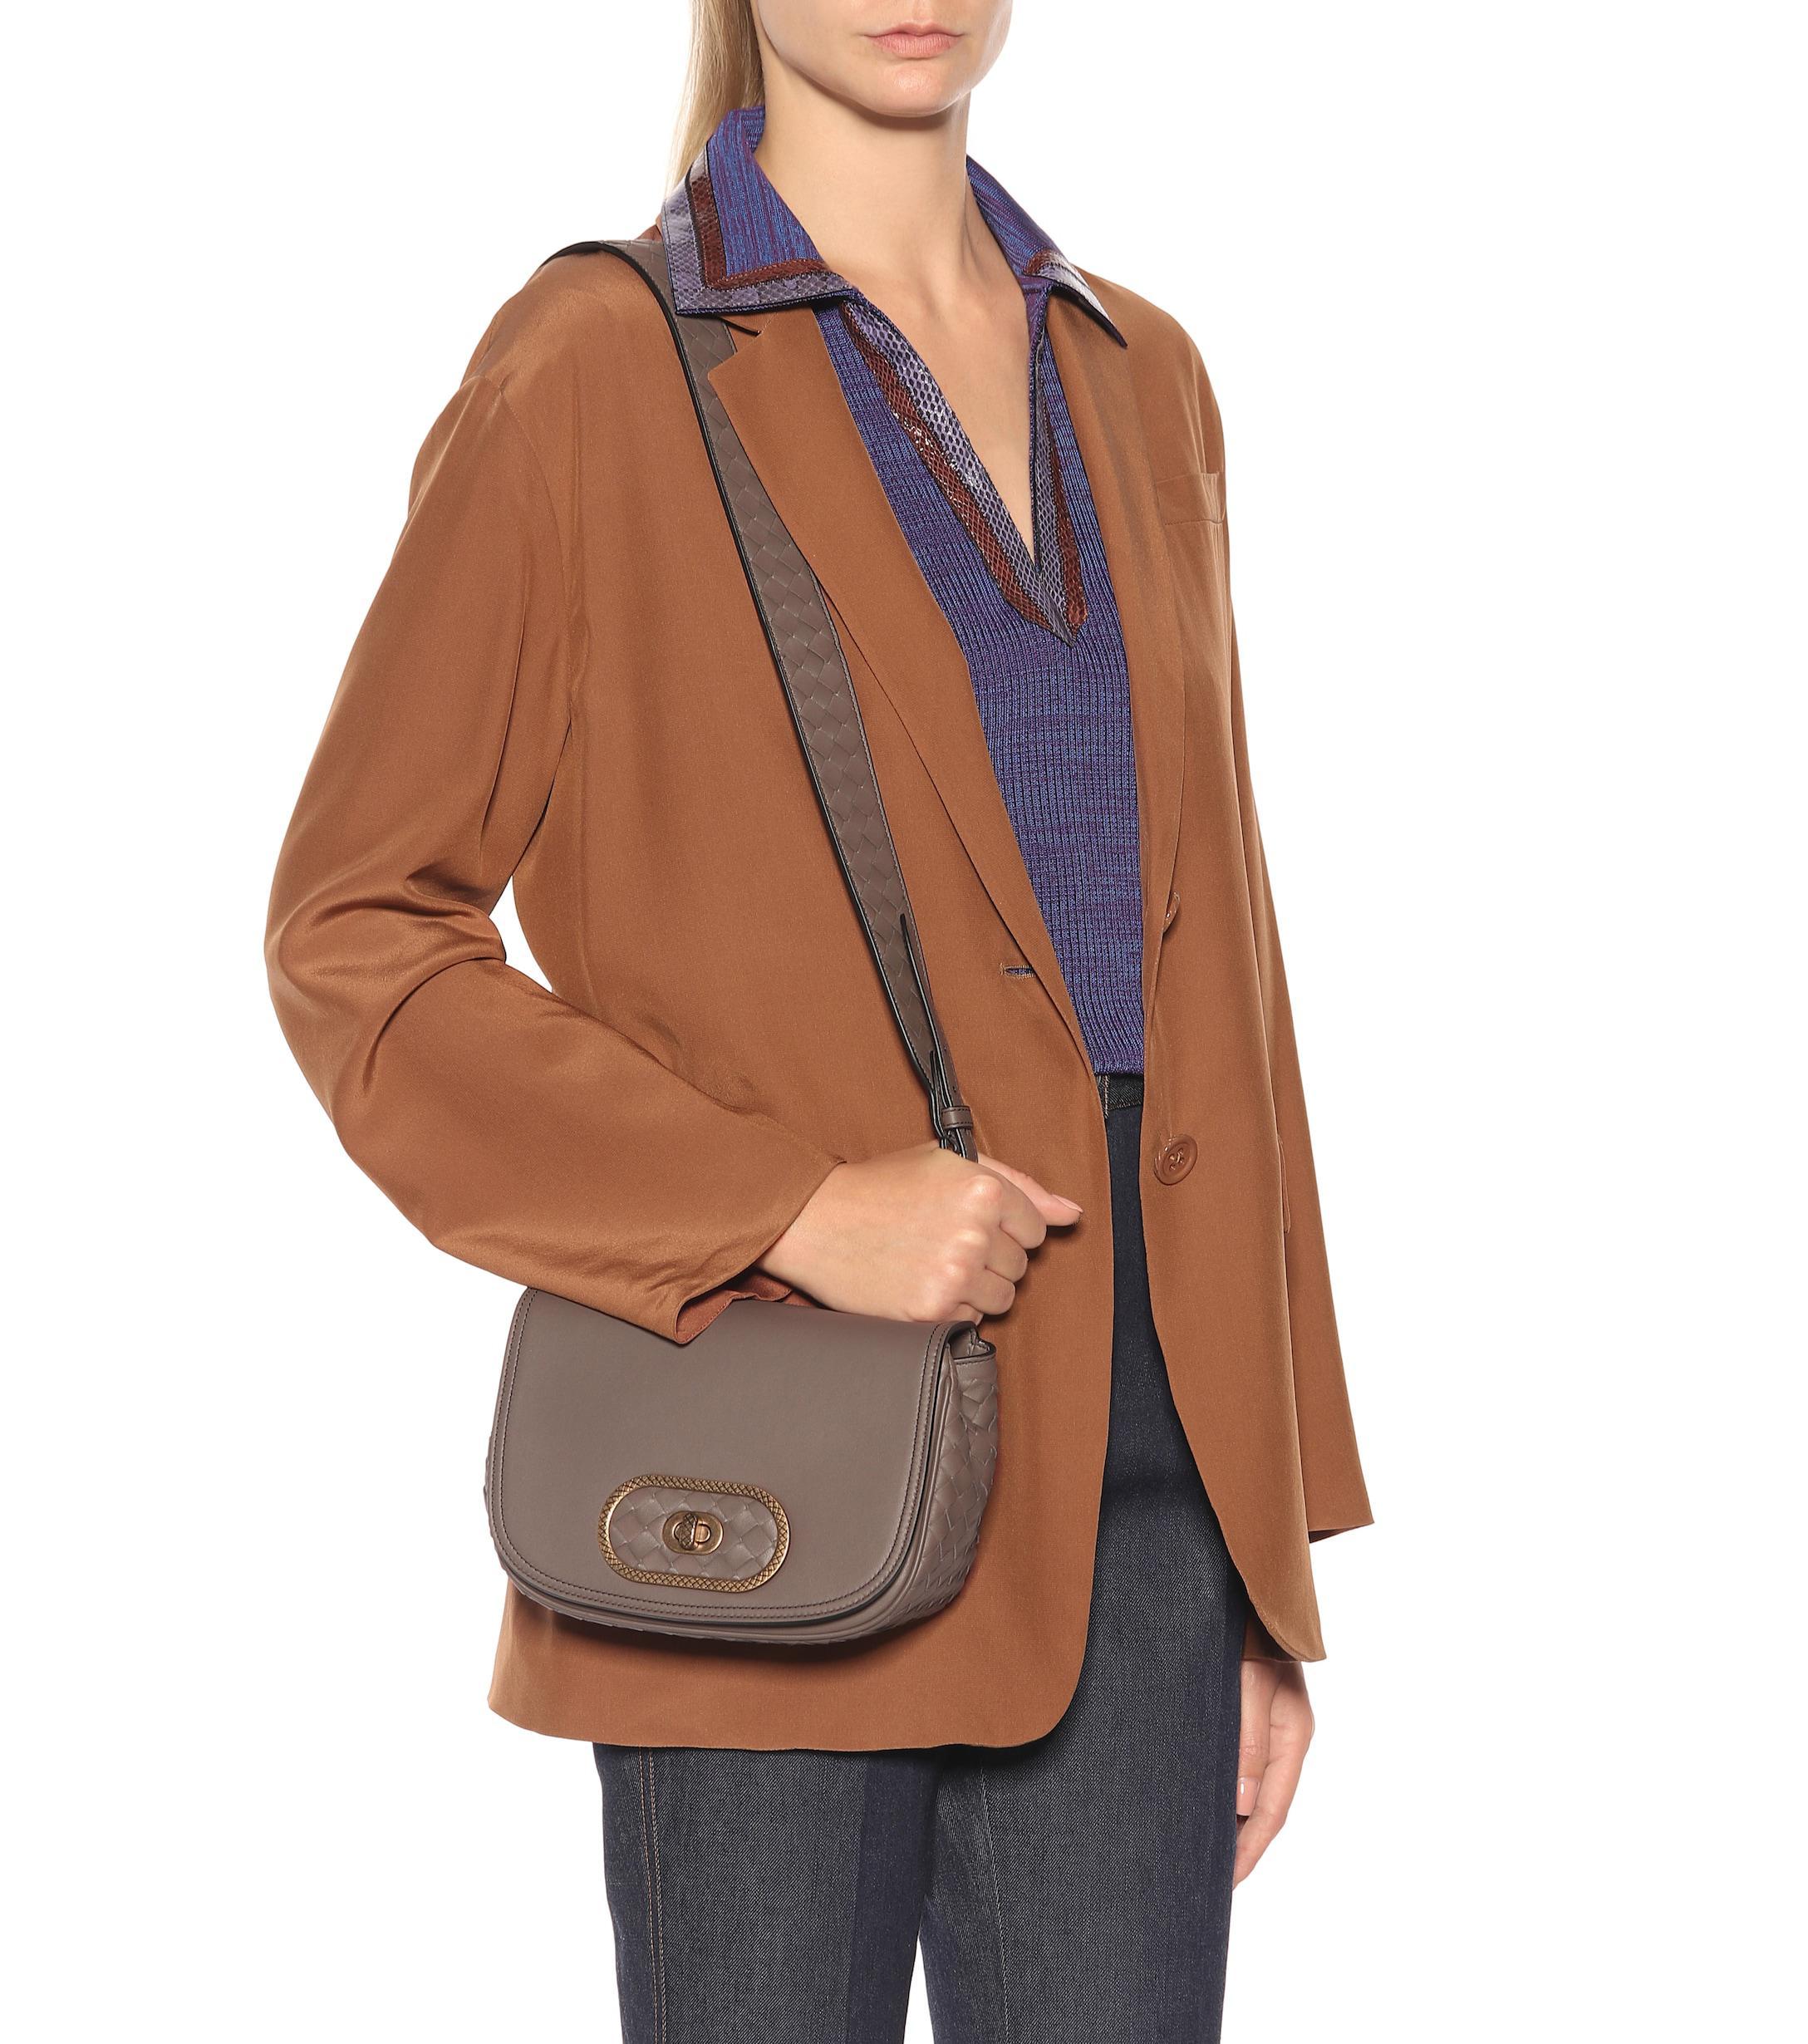 004abeb8a67 Bottega Veneta - Multicolor Bv Luna Leather Crossbody Bag - Lyst. View  fullscreen